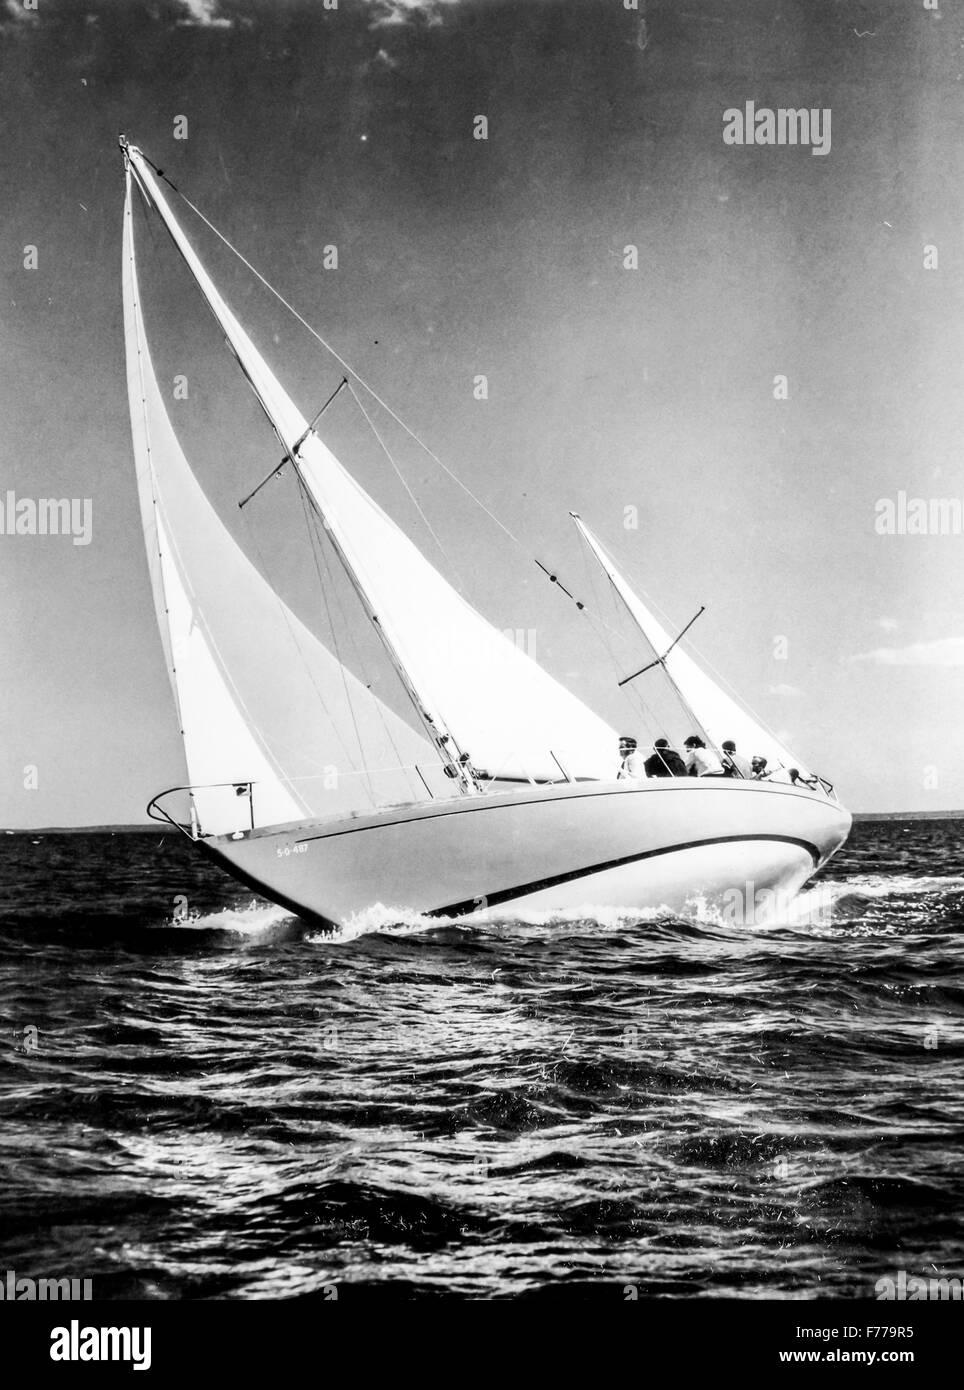 fiberglass sailboat,bermuda race,1958 - Stock Image